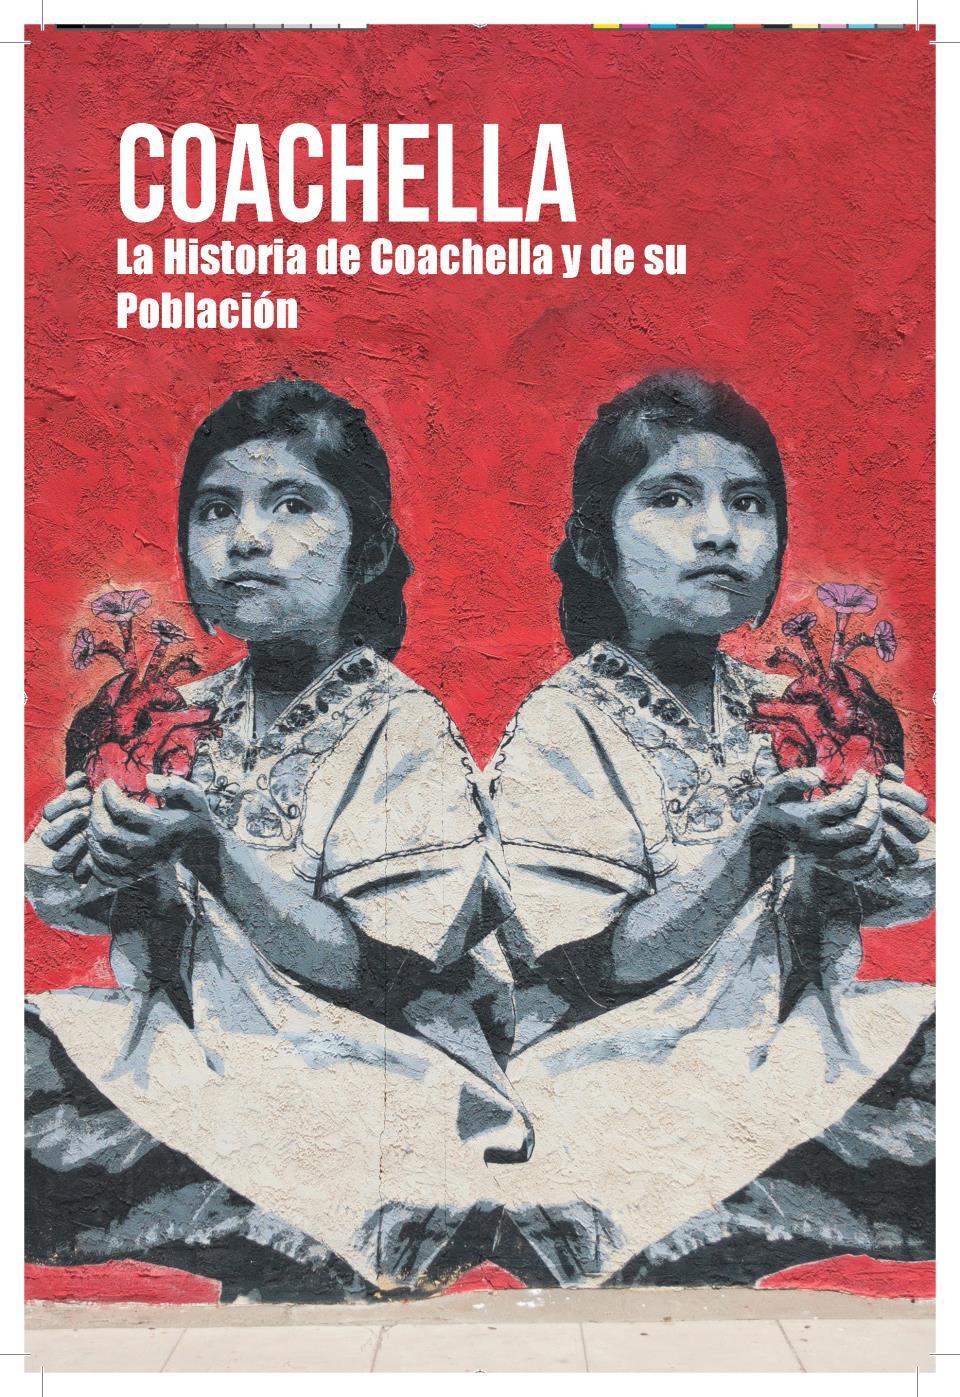 Coachella History Spanish cover